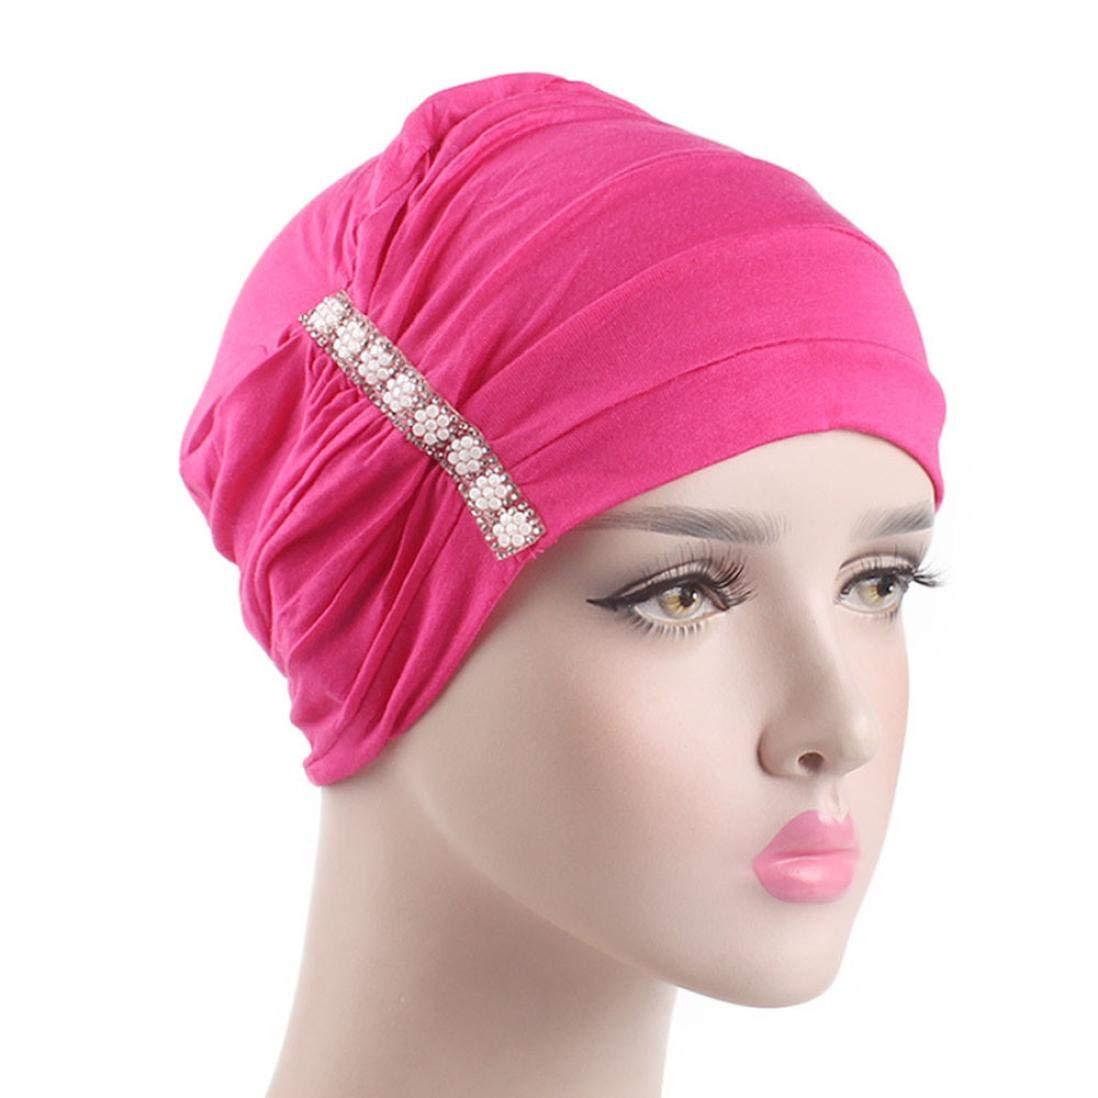 Amazon.com  Sunny Love 2018 Women Elastic Hijab Cancer Hat Chemo Turban  Wrap Cap Hair Loss Head Scarf Fitted Hat (Wine)  Sports   Outdoors 52b0edde3538